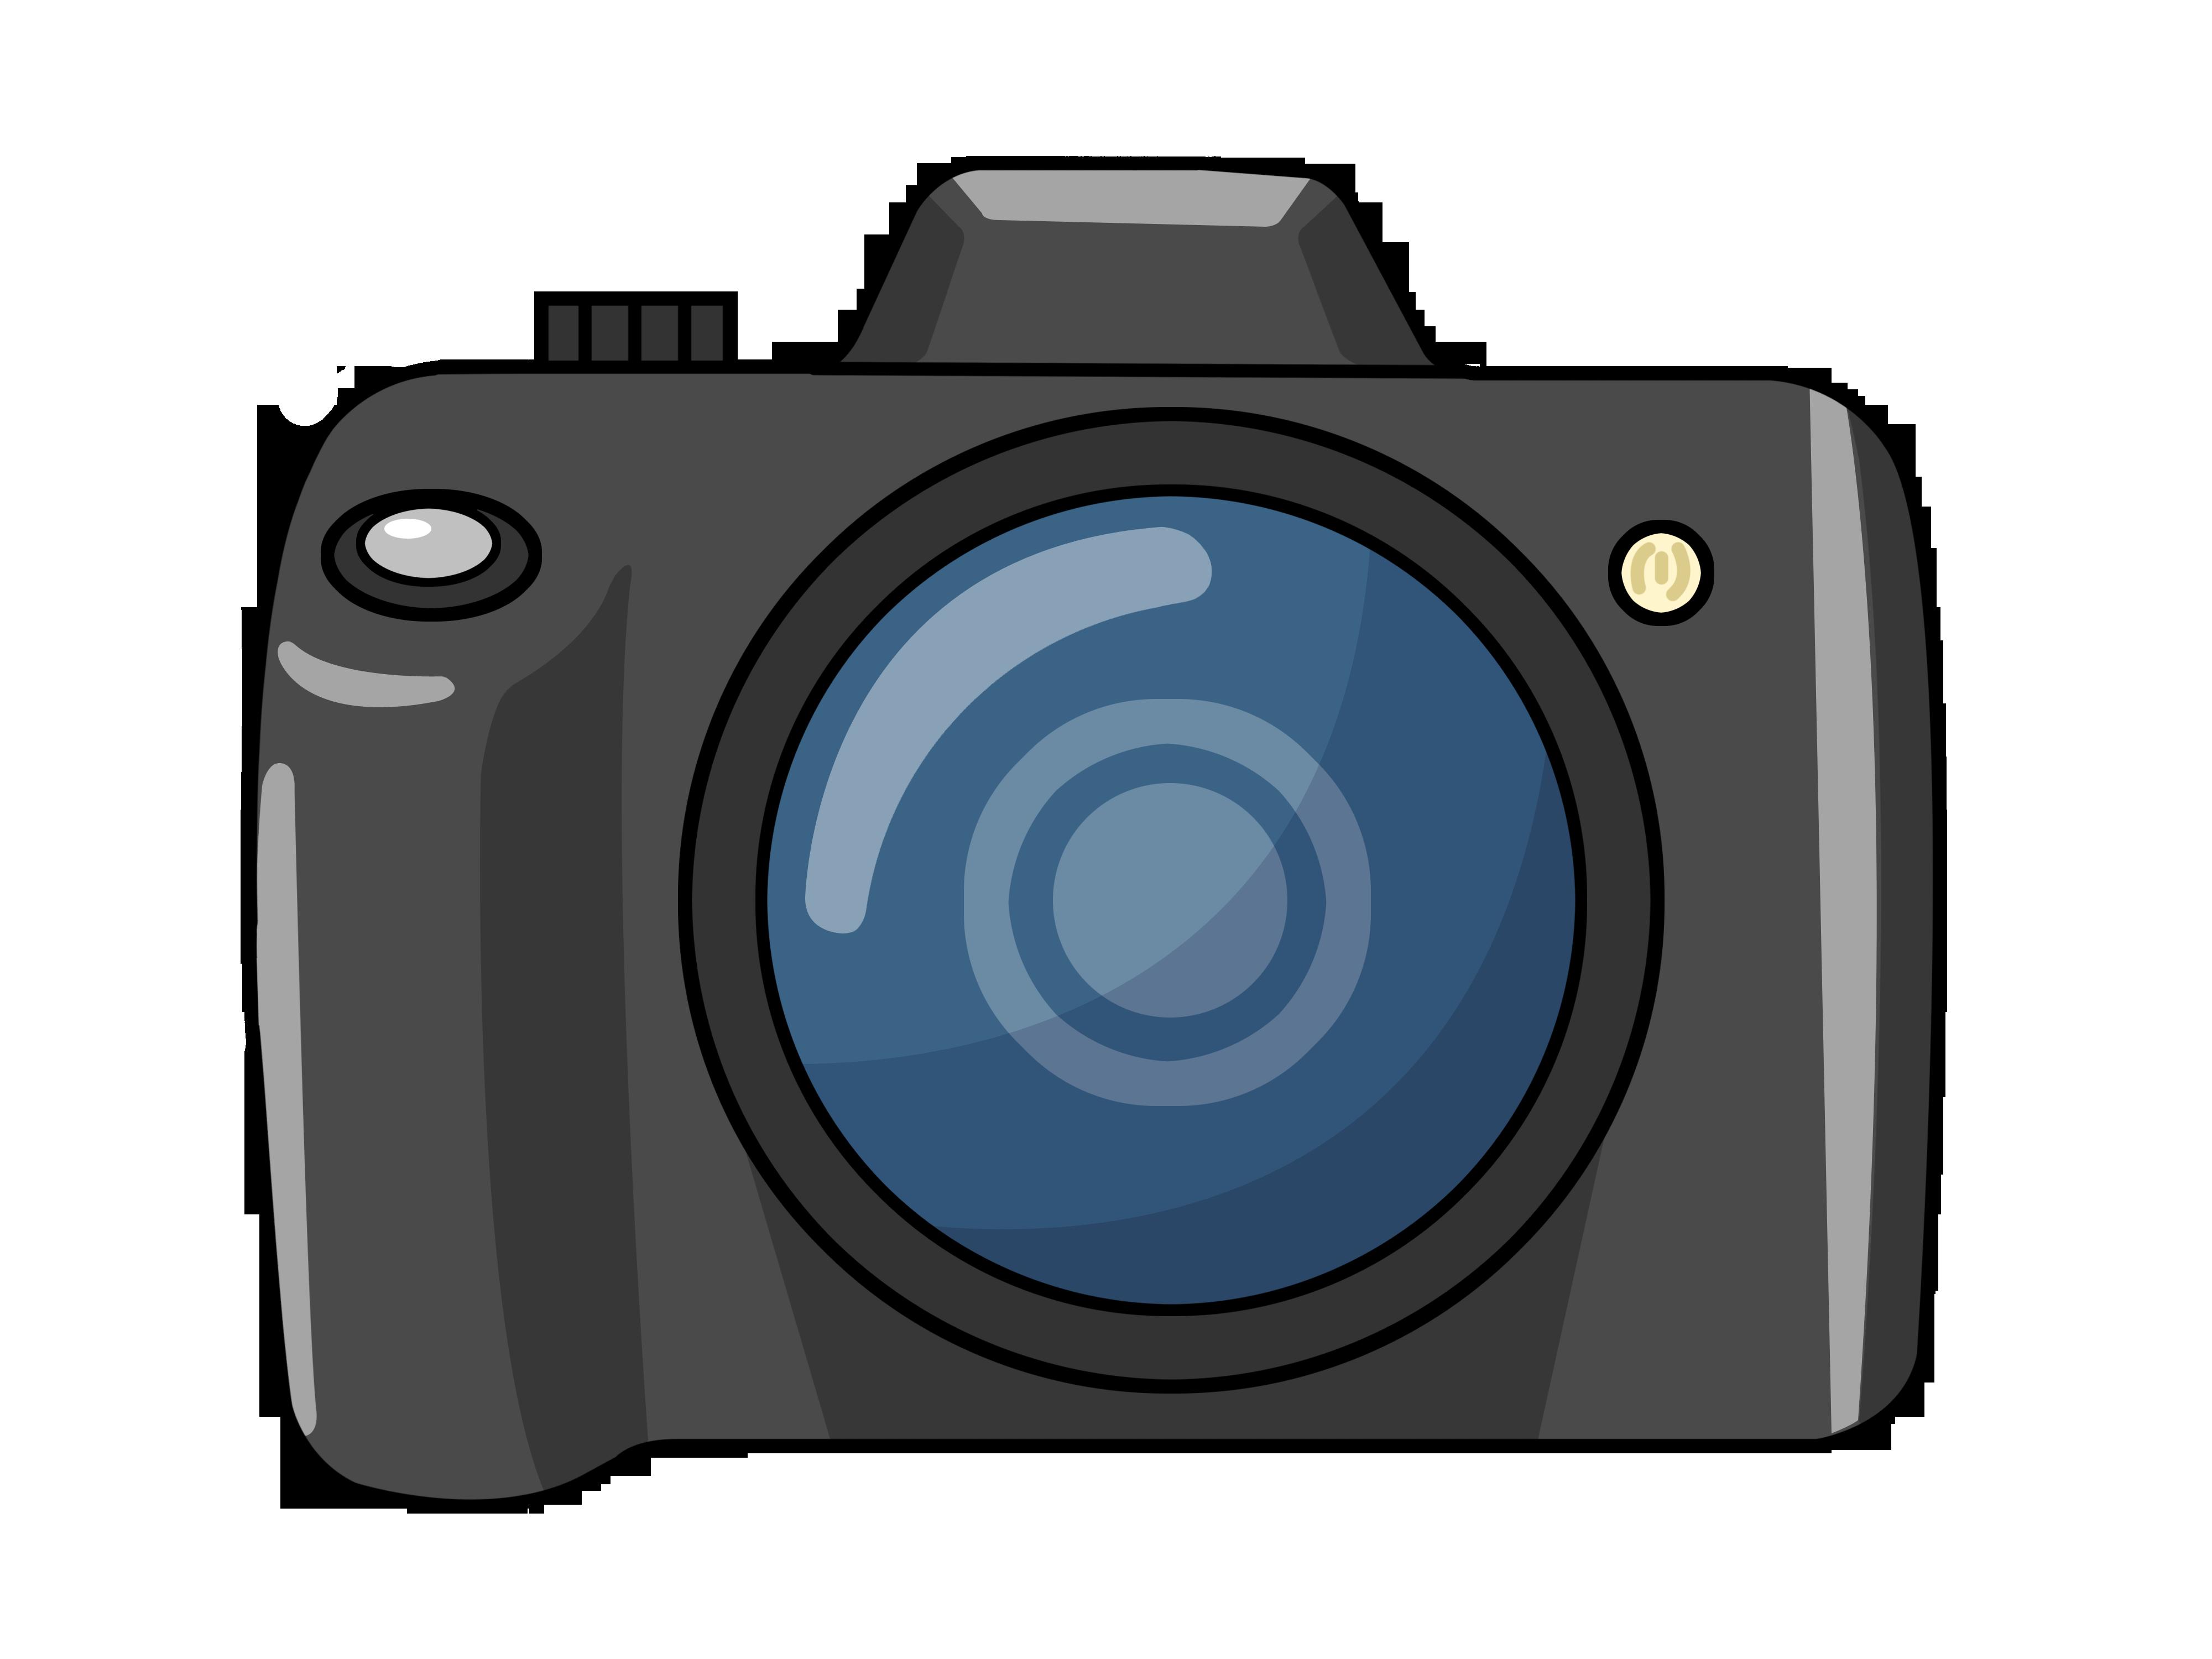 Free Cartoon Camera Cliparts, Download Free Clip Art, Free.